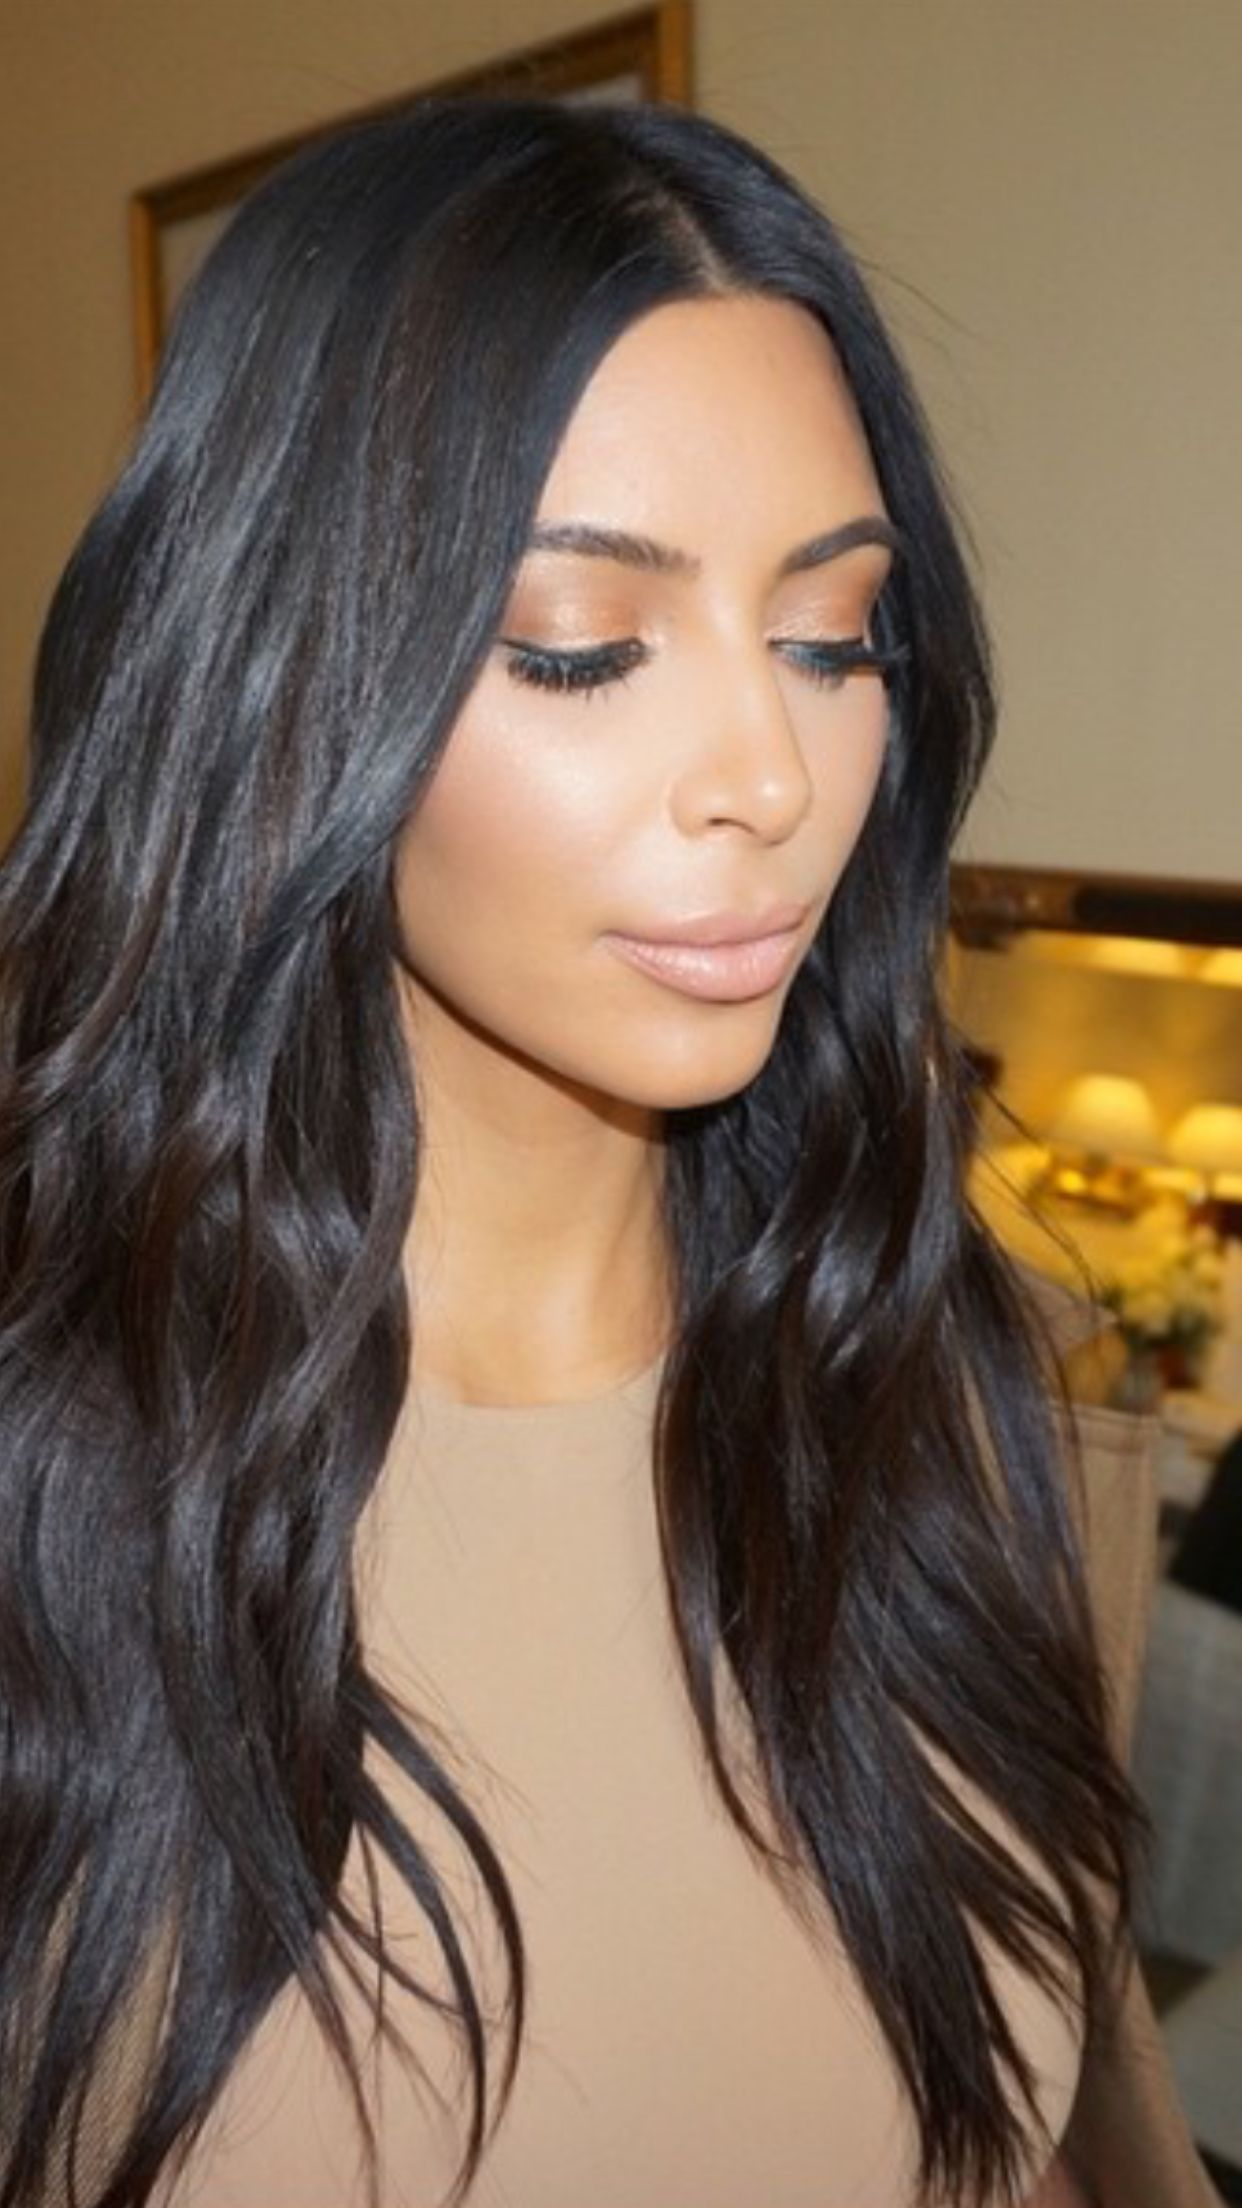 Kim Kardashian hair April 2015 this board for the Khronology of